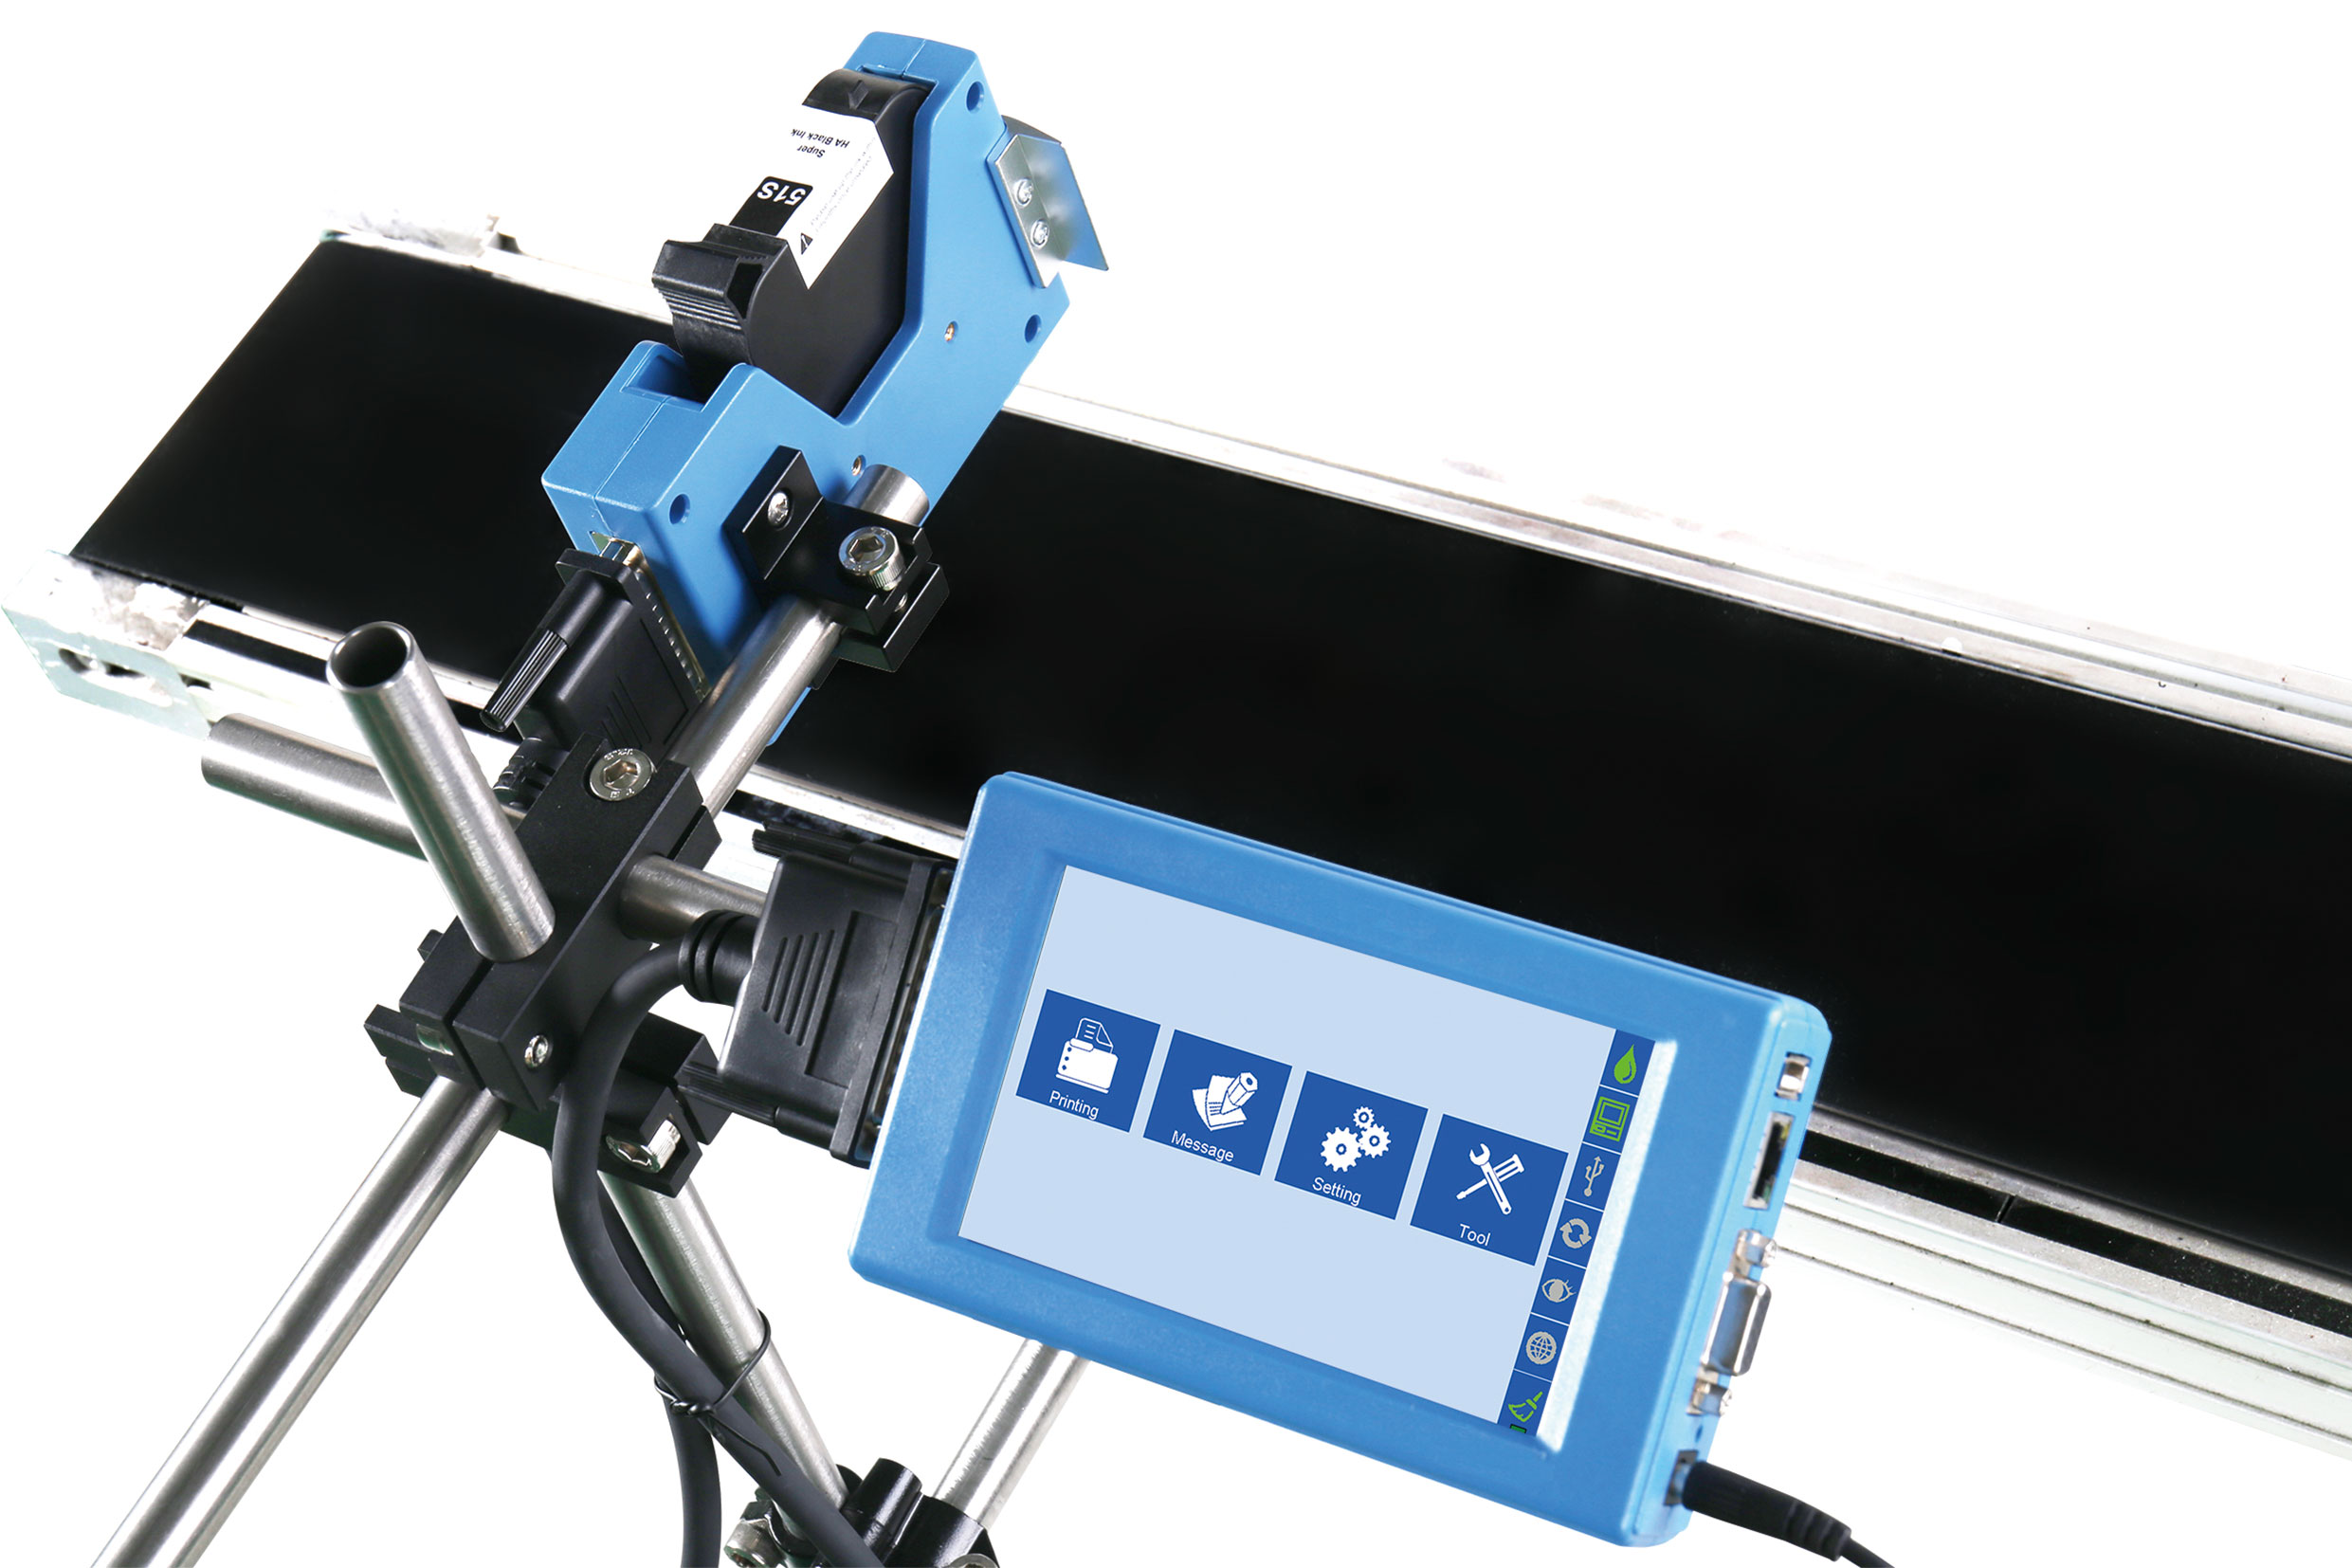 elfin 1d e 2x3 - Thermal Inkjet Printers